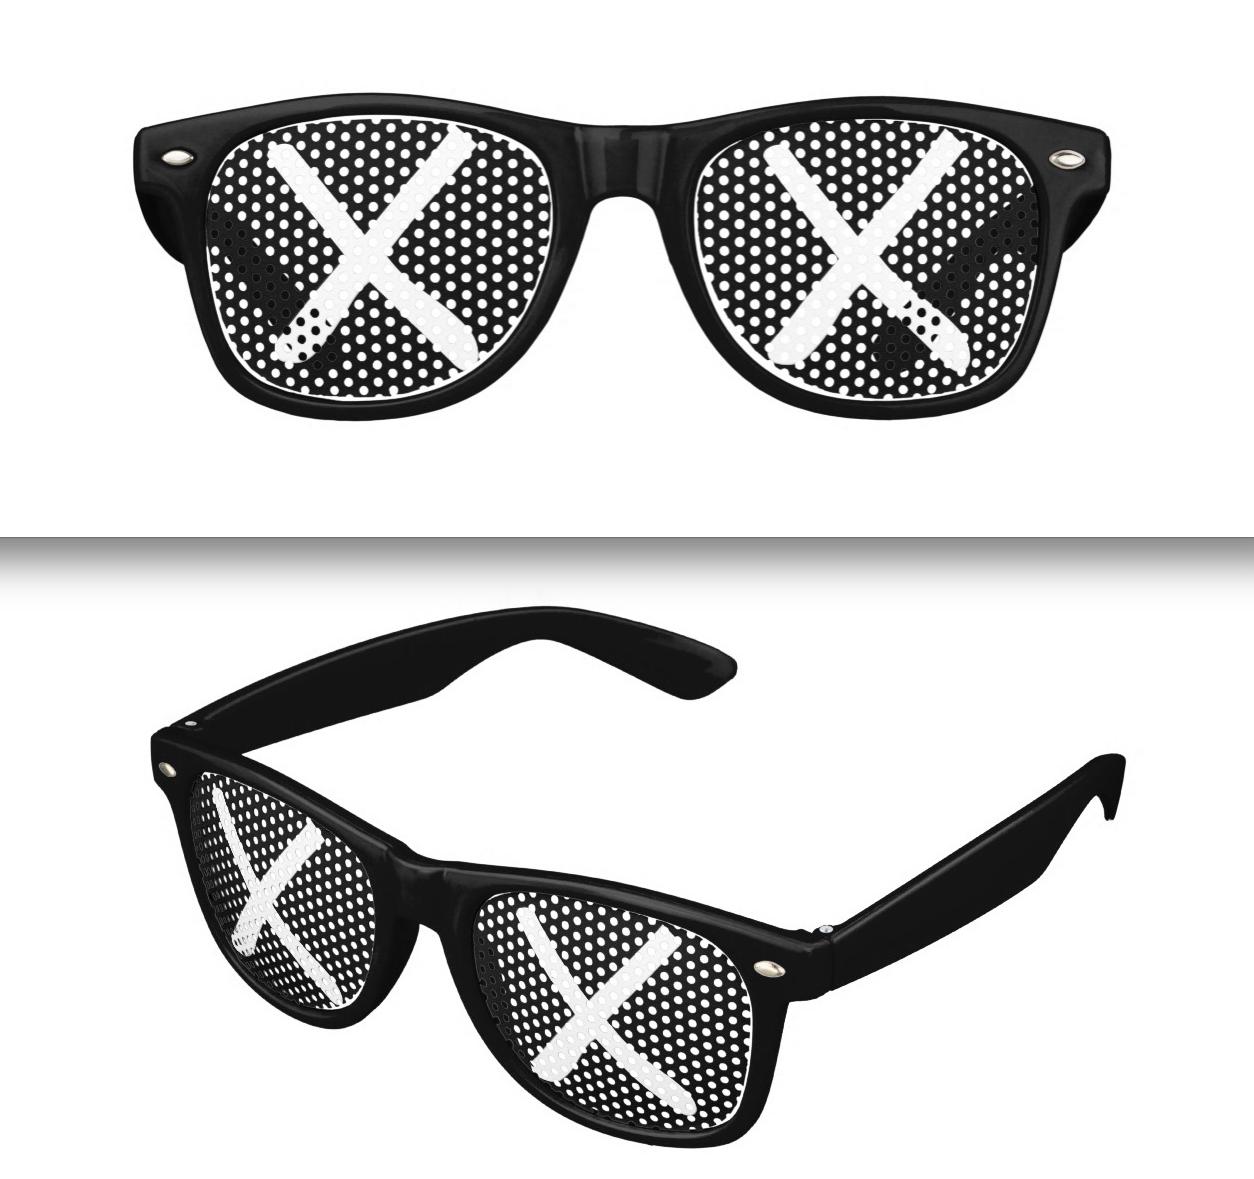 kaws x snoopy sunglasses double xx eyes graffiti art. Black Bedroom Furniture Sets. Home Design Ideas